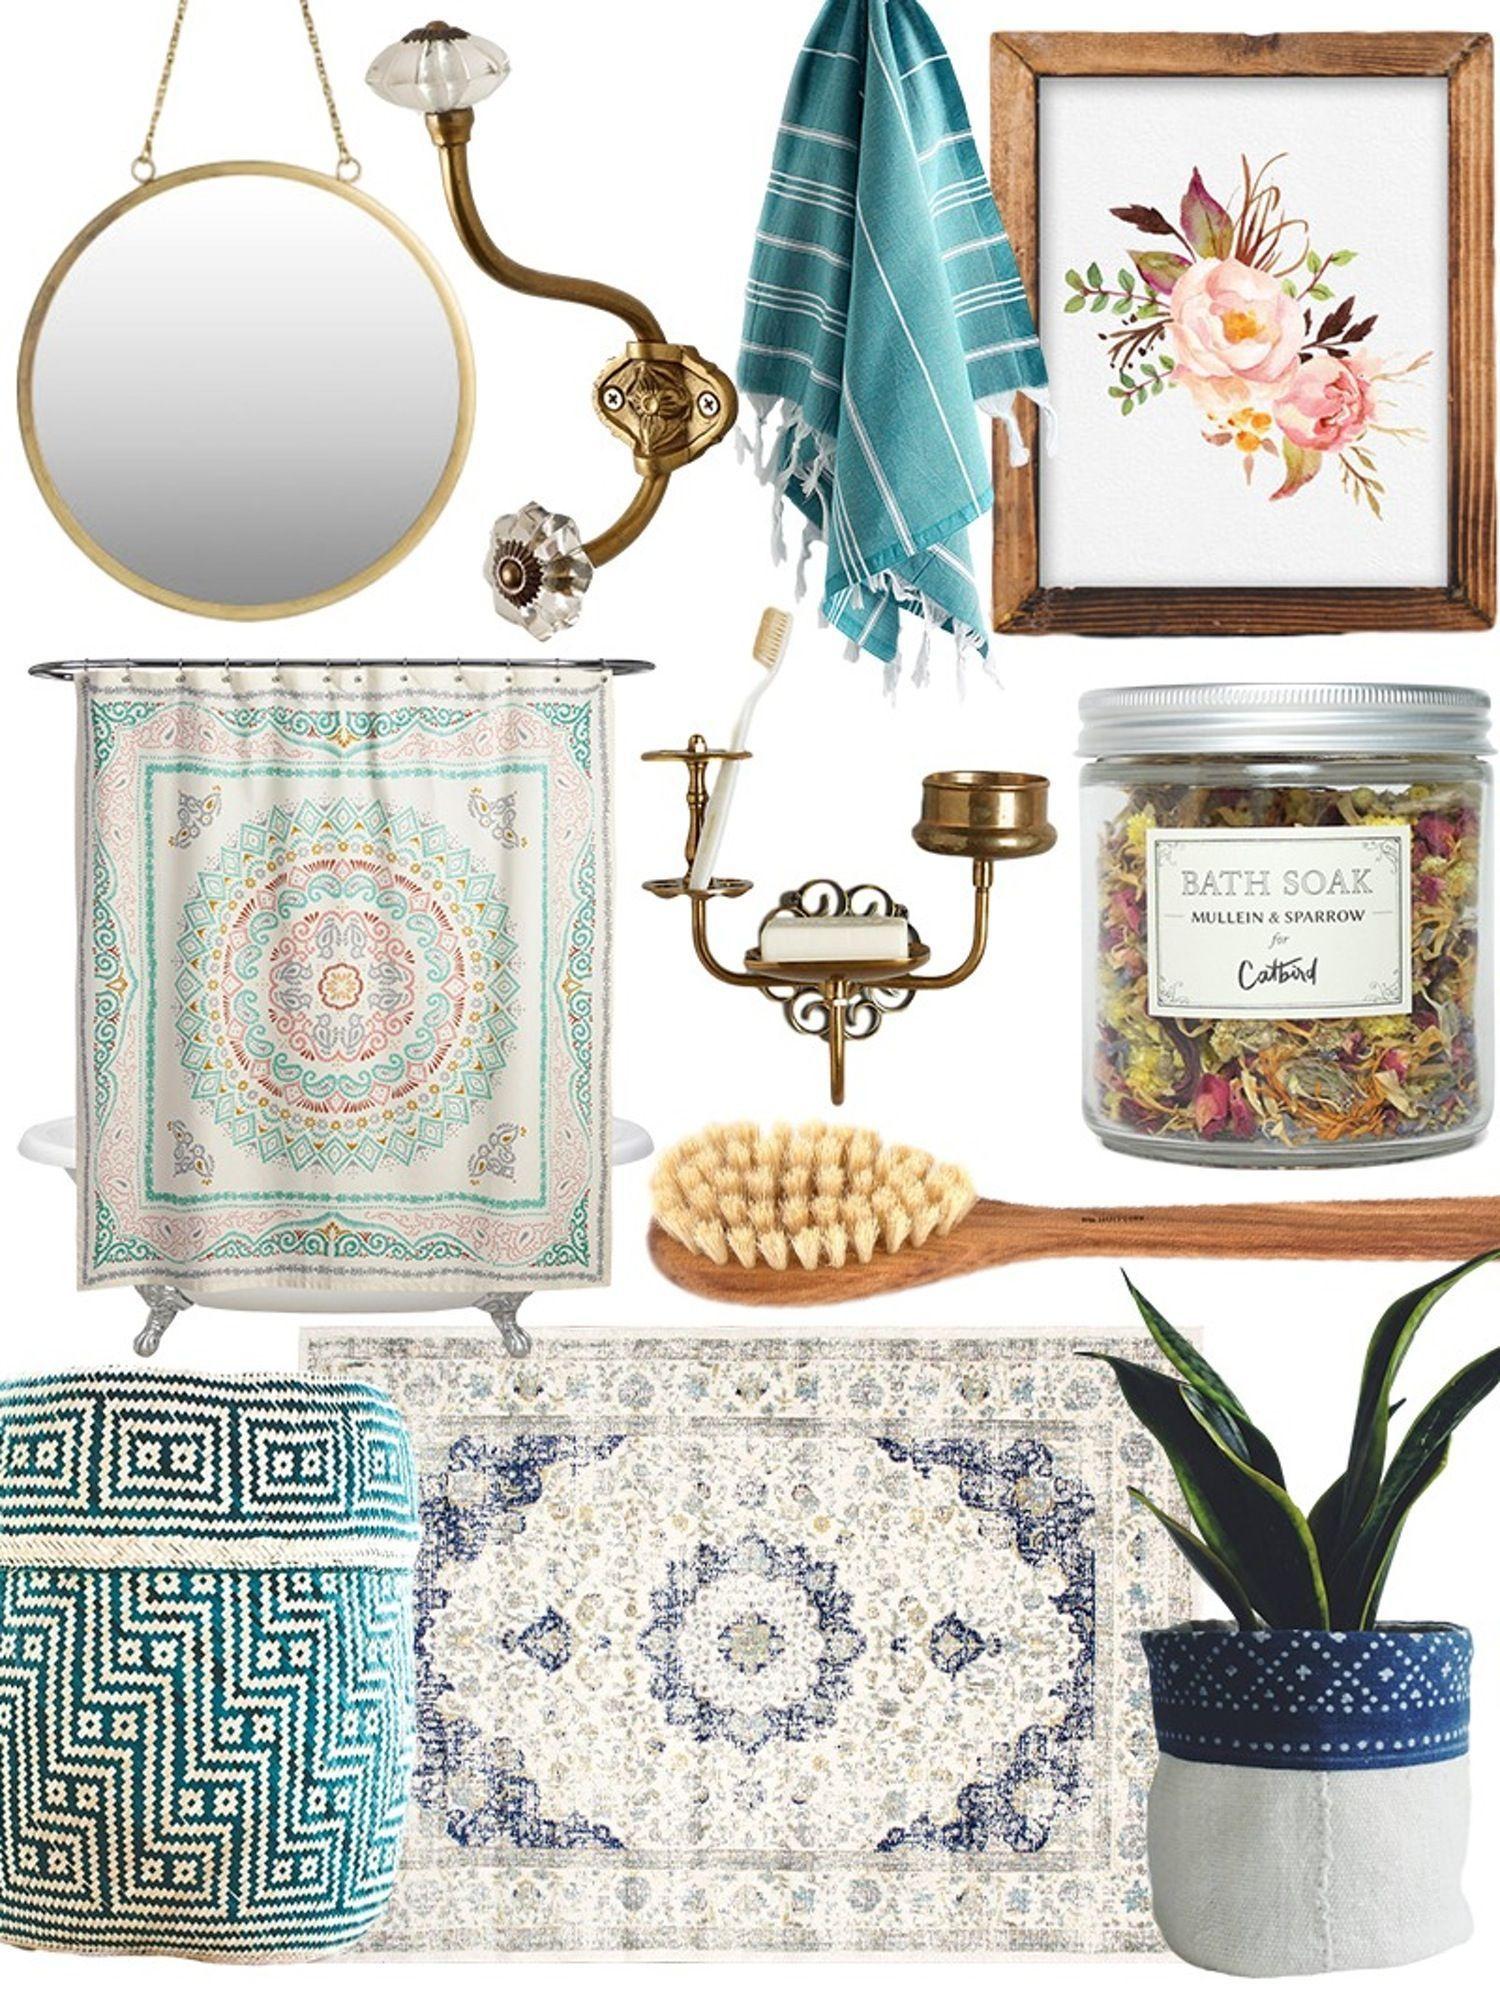 Create The Look Artful Bohemian Bathroom Shopping Guide